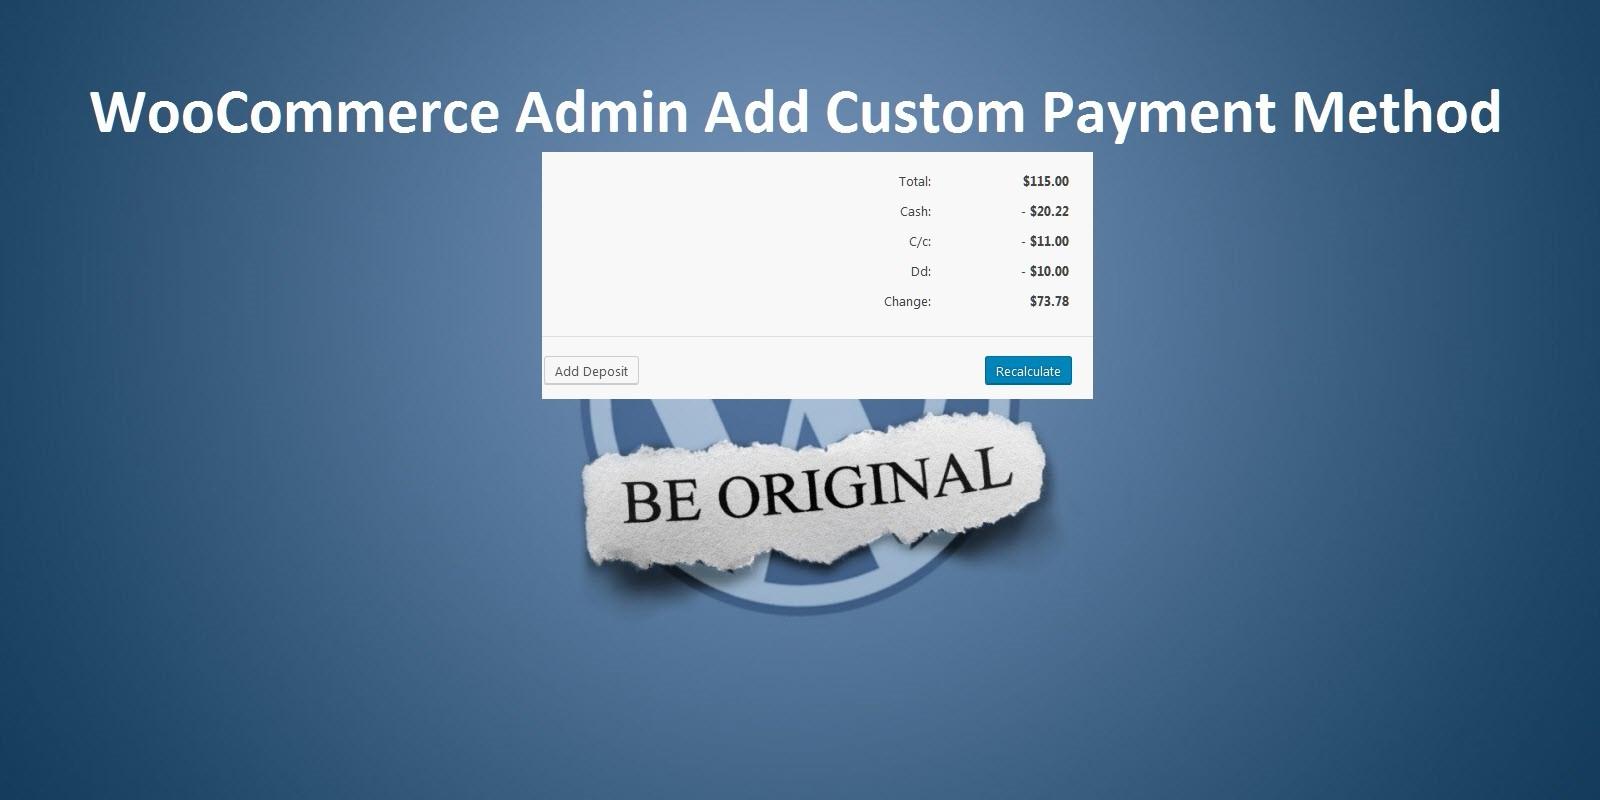 WooCommerce Admin Add Custom Payment Method